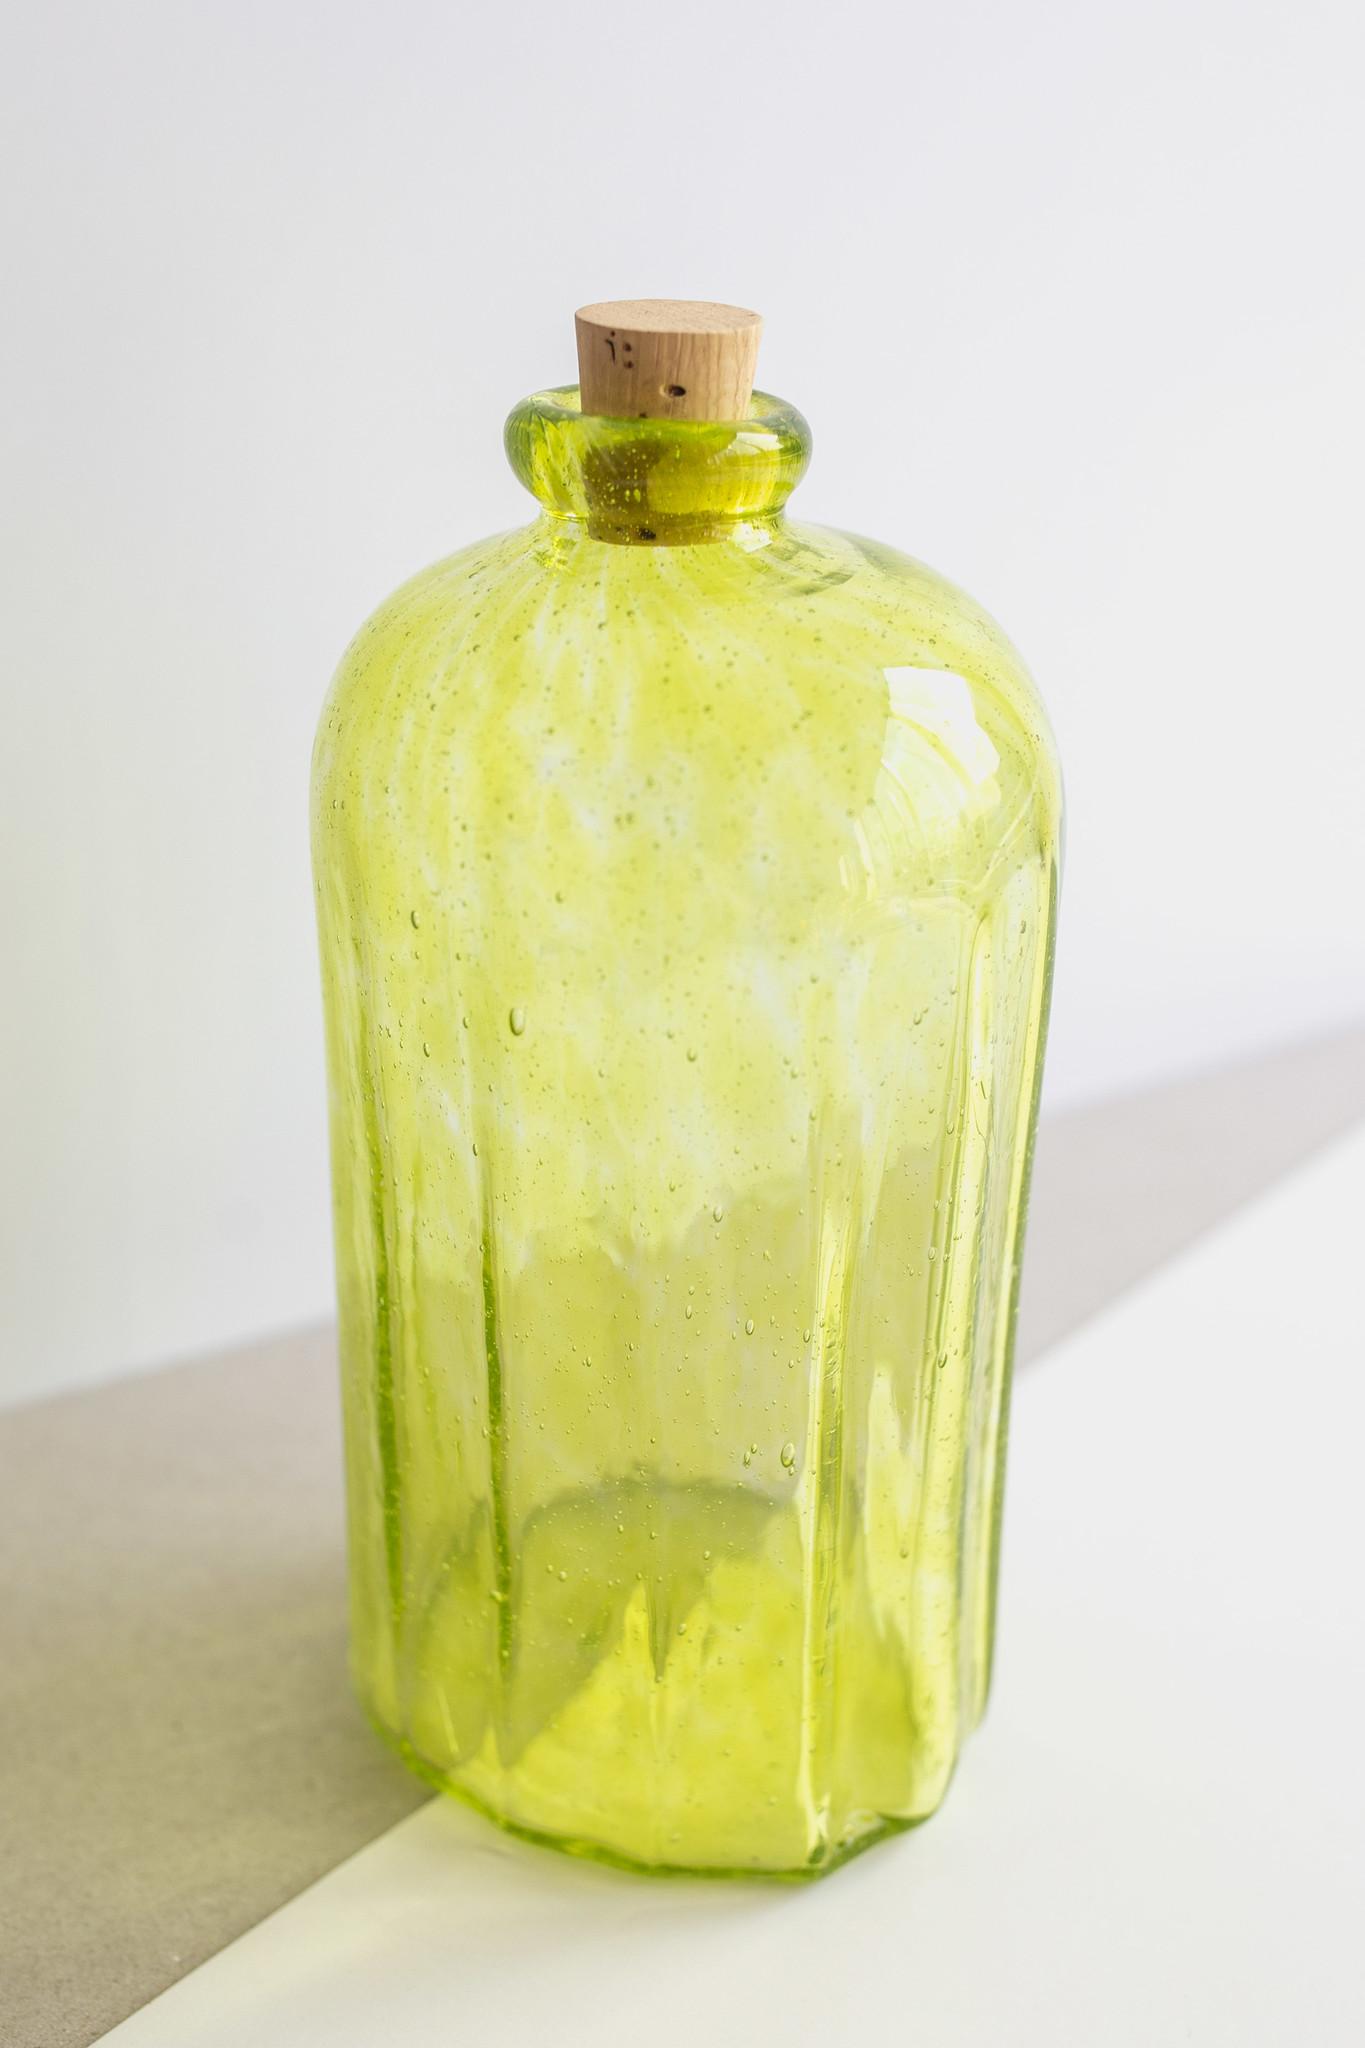 Hand-blown glass Bottle